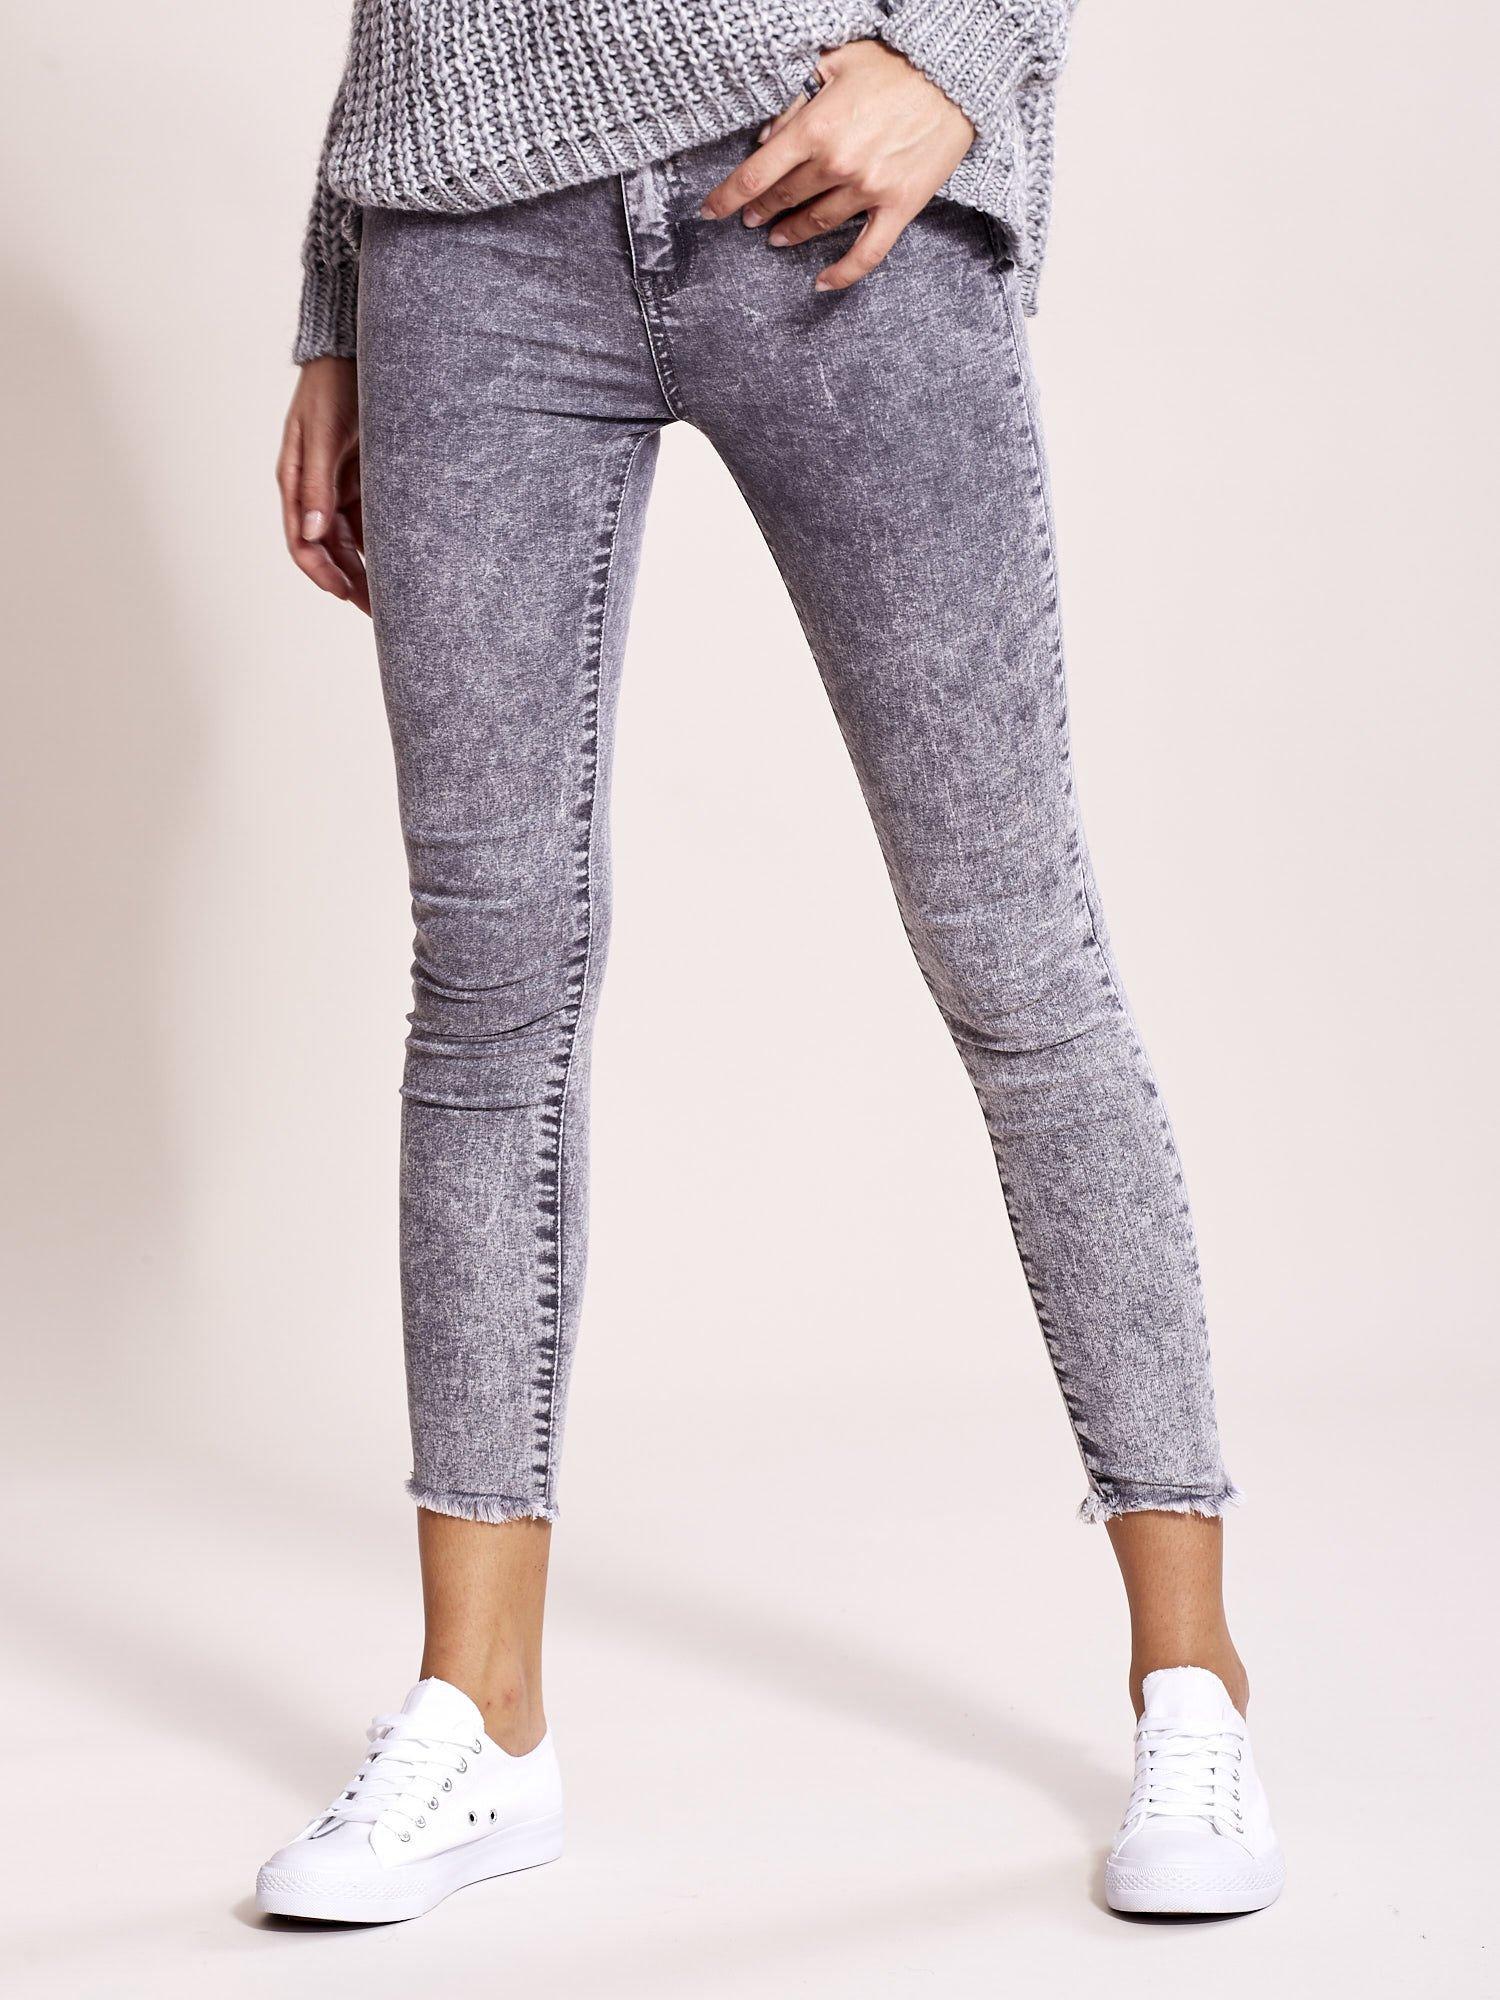 107966a7 Szare jeansy damskie high waist